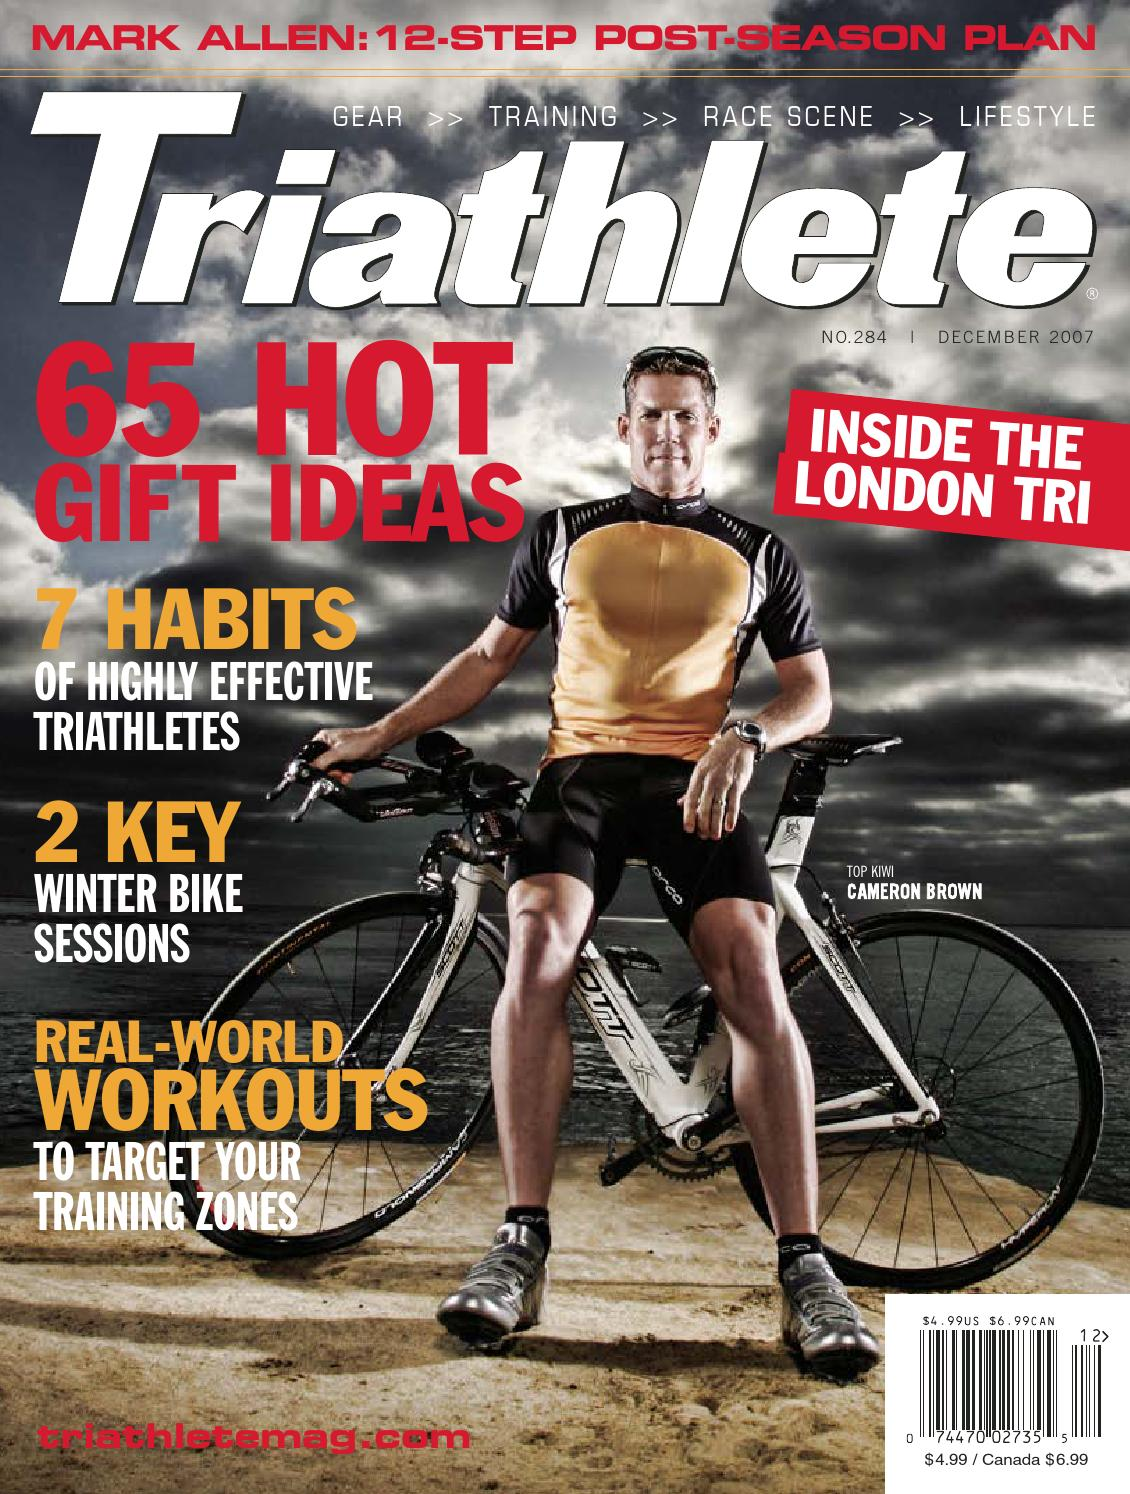 027716bed096 2007-12 Triathlete by Alejandro Piñeiro - issuu